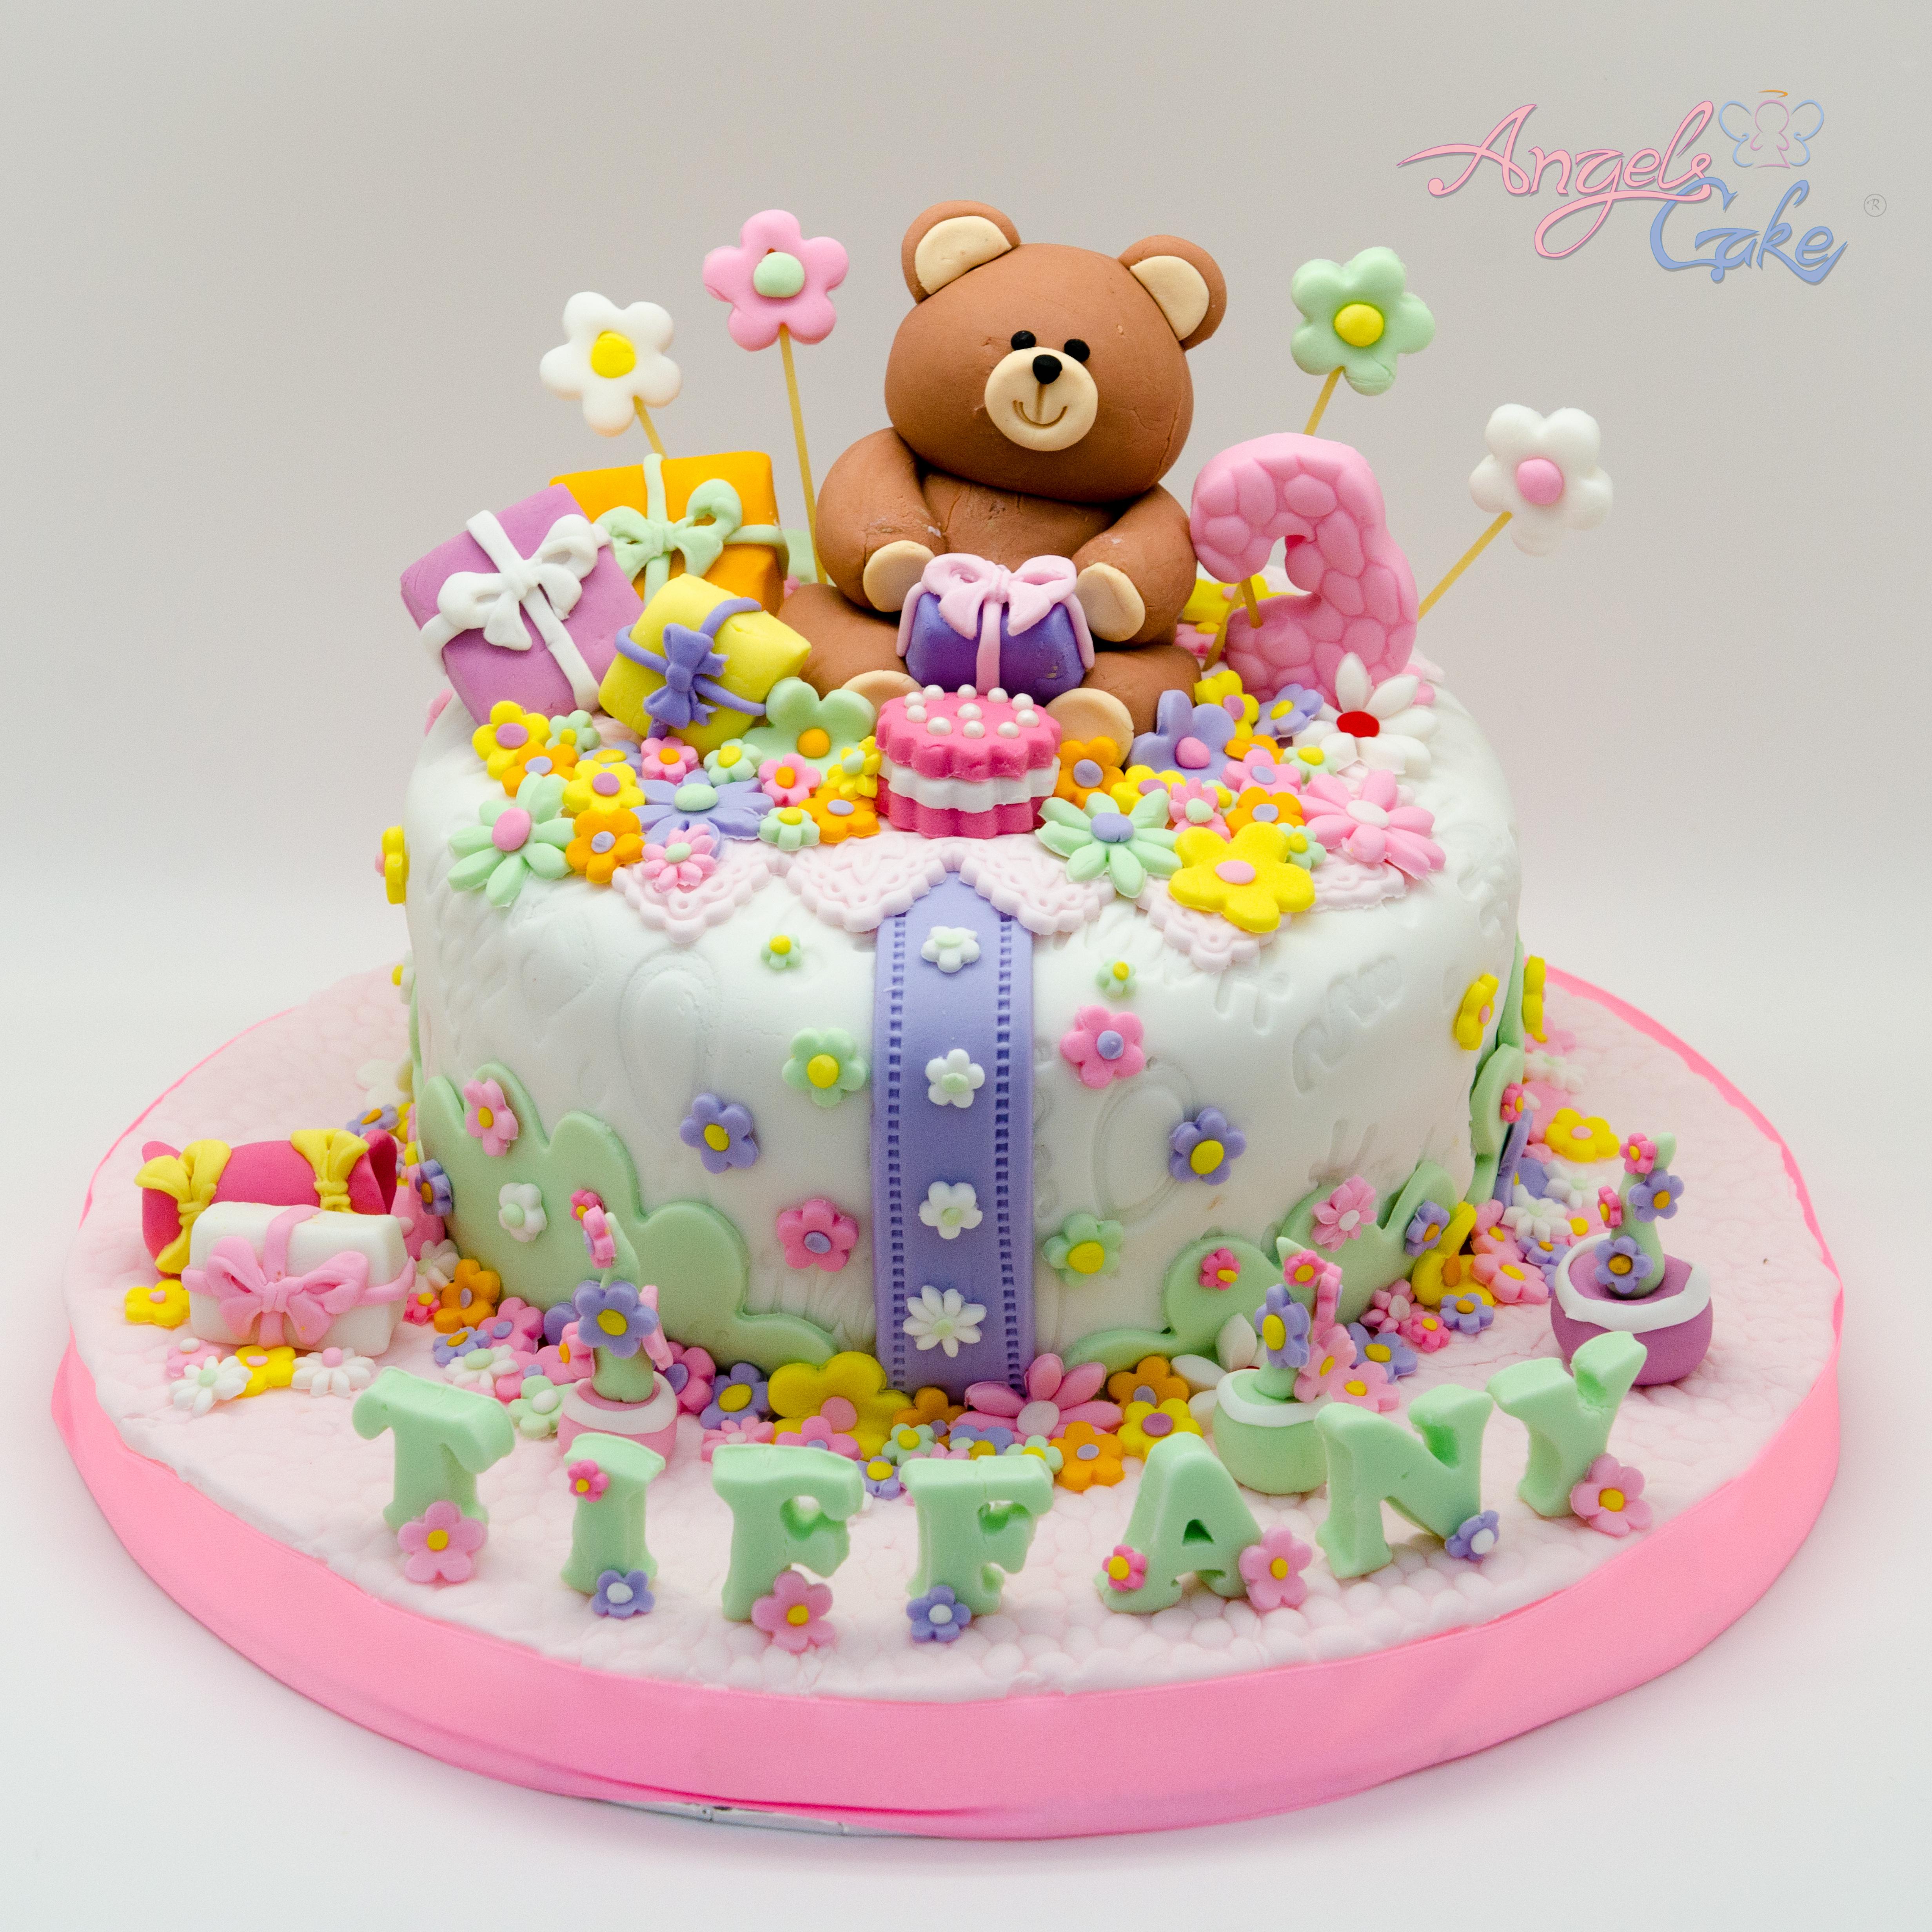 Teddy Bear In The Garden Angels Cake S Blog